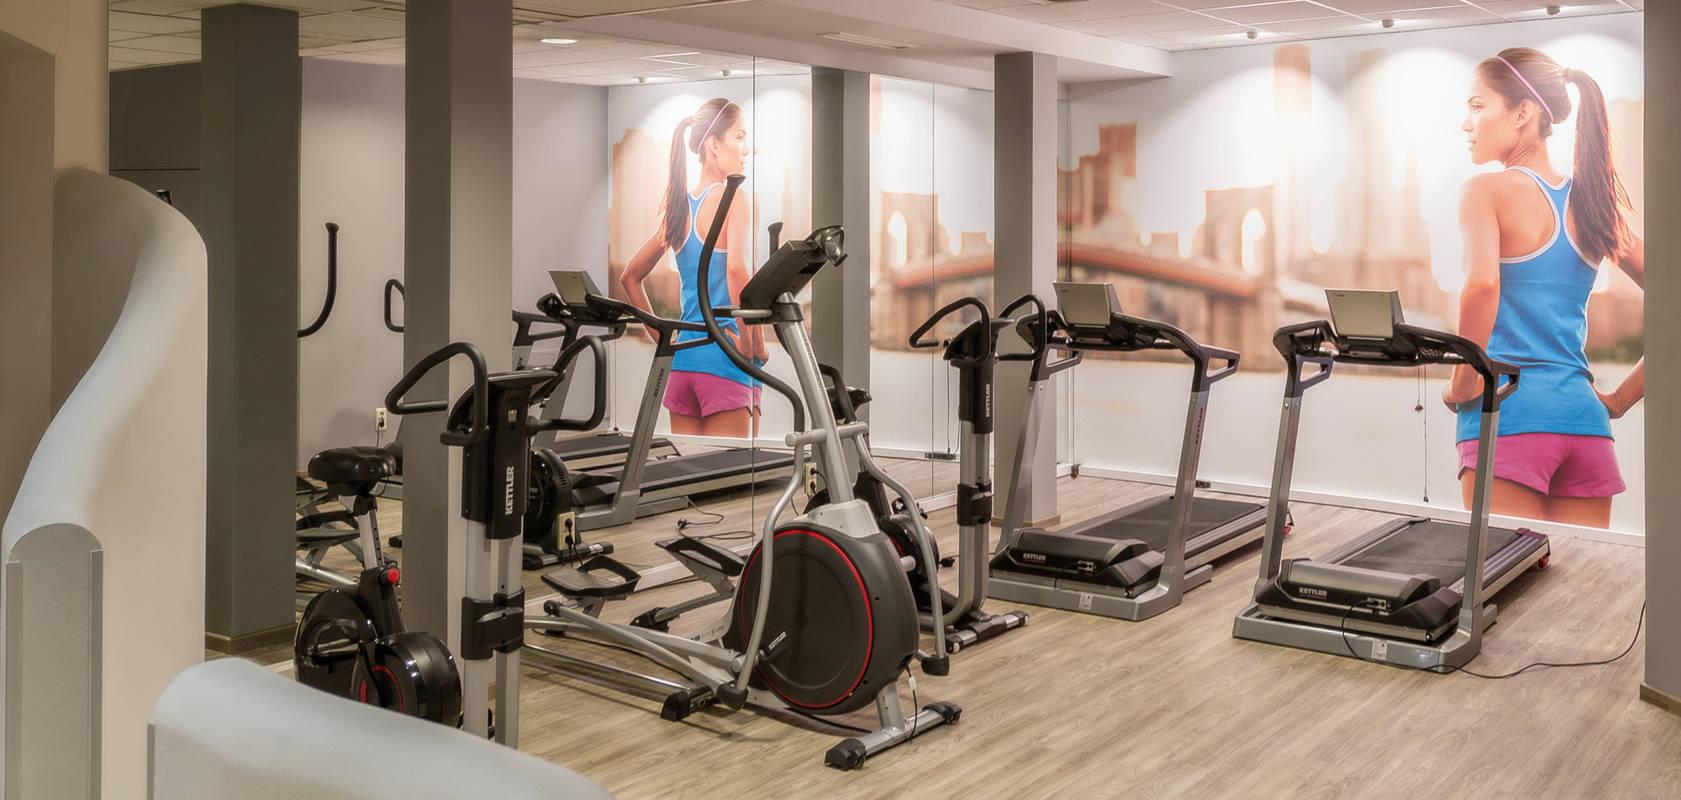 City Hotel Fitnessraum